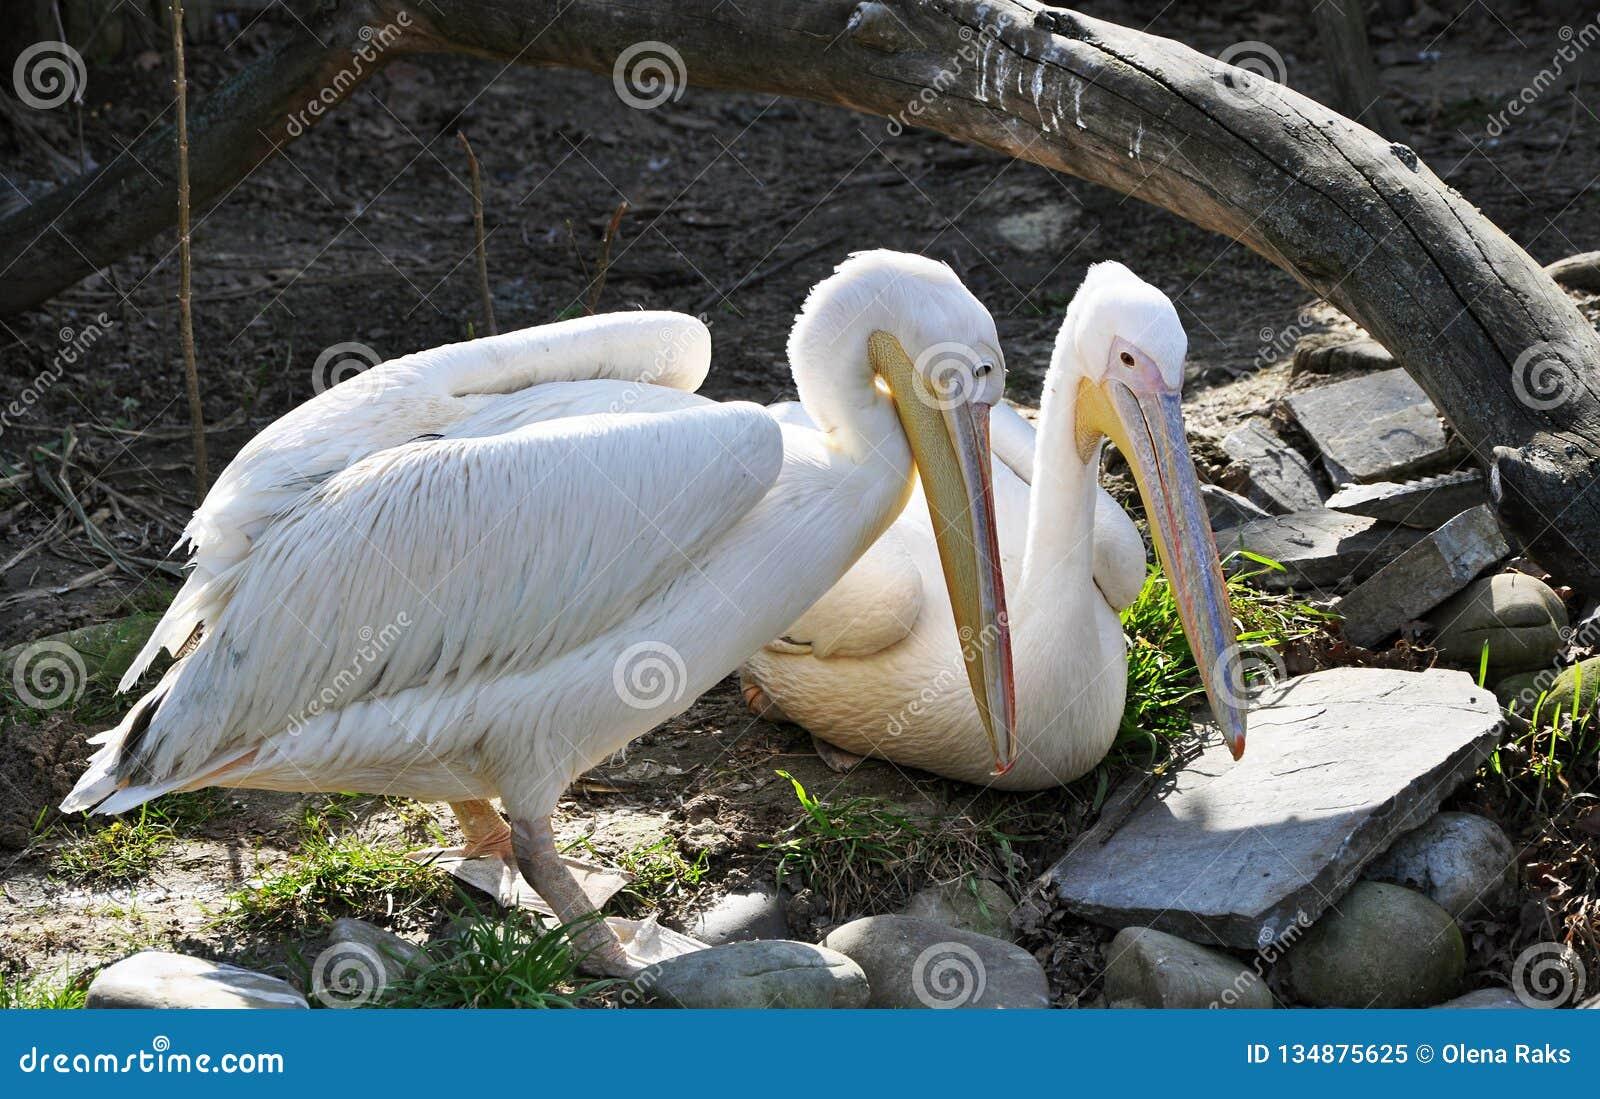 Pair of white pelicans having rest